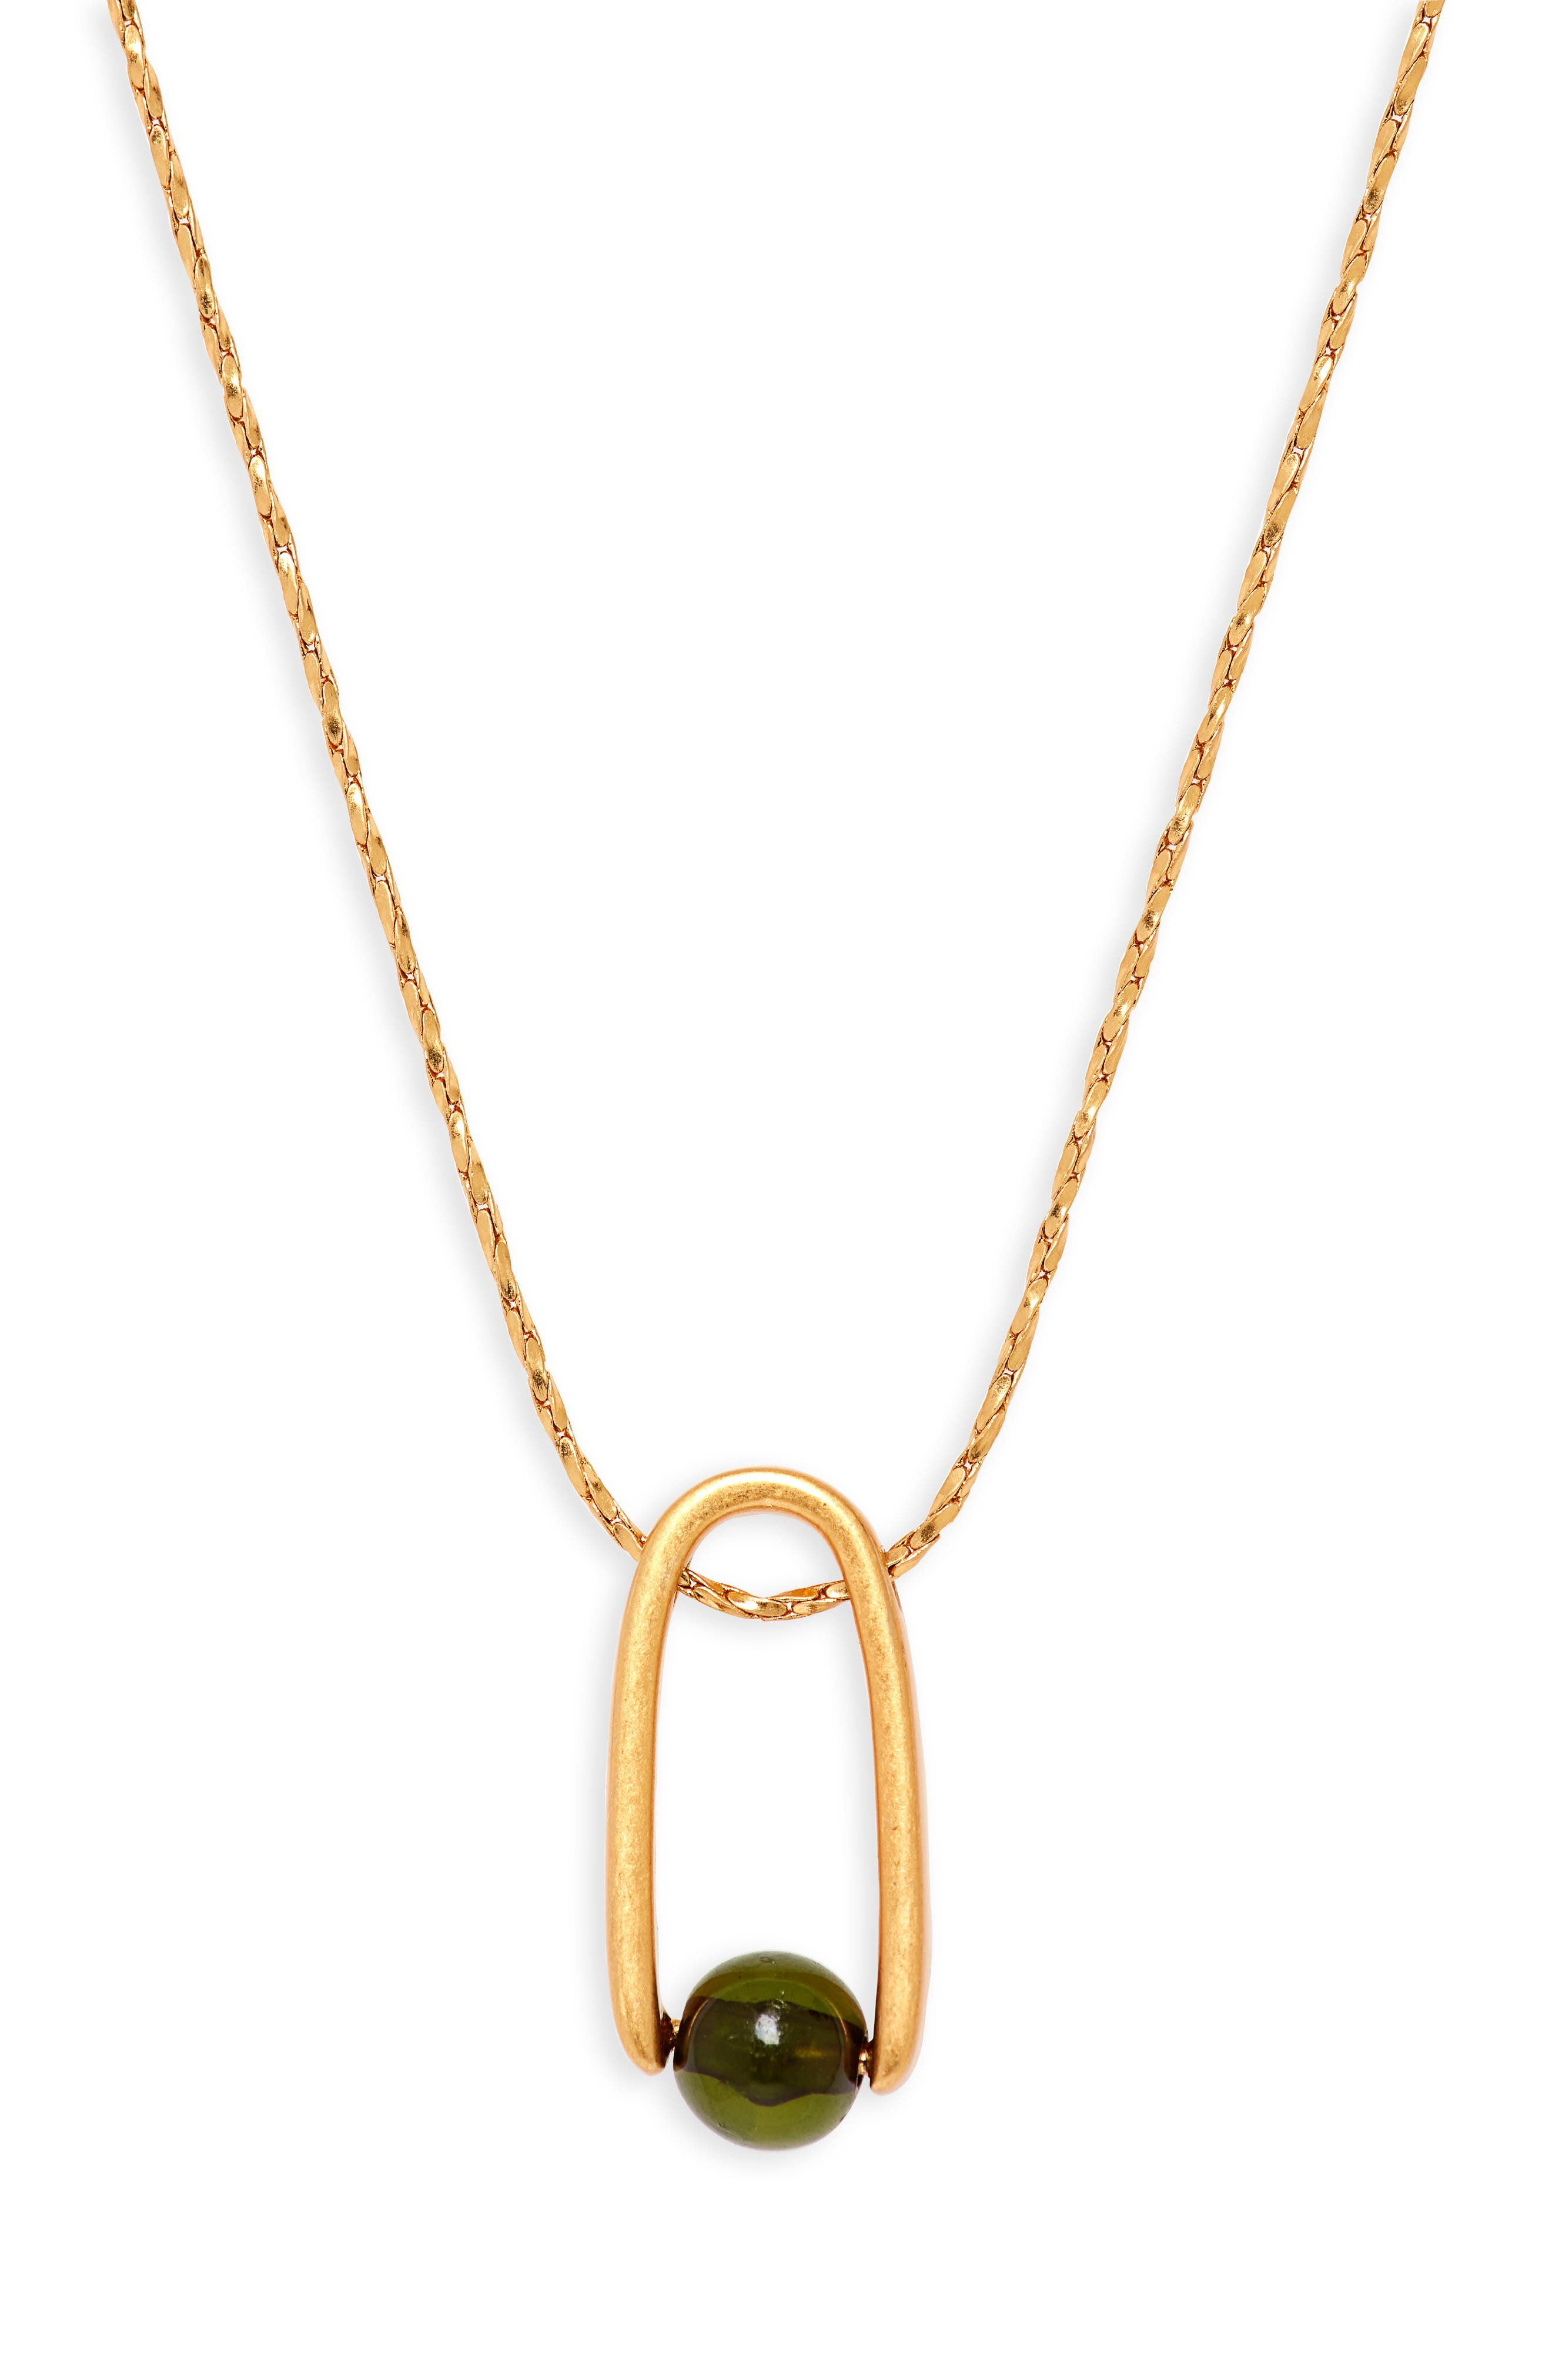 Resin Pinball Pendant Necklace,                             Main thumbnail 1, color,                             710